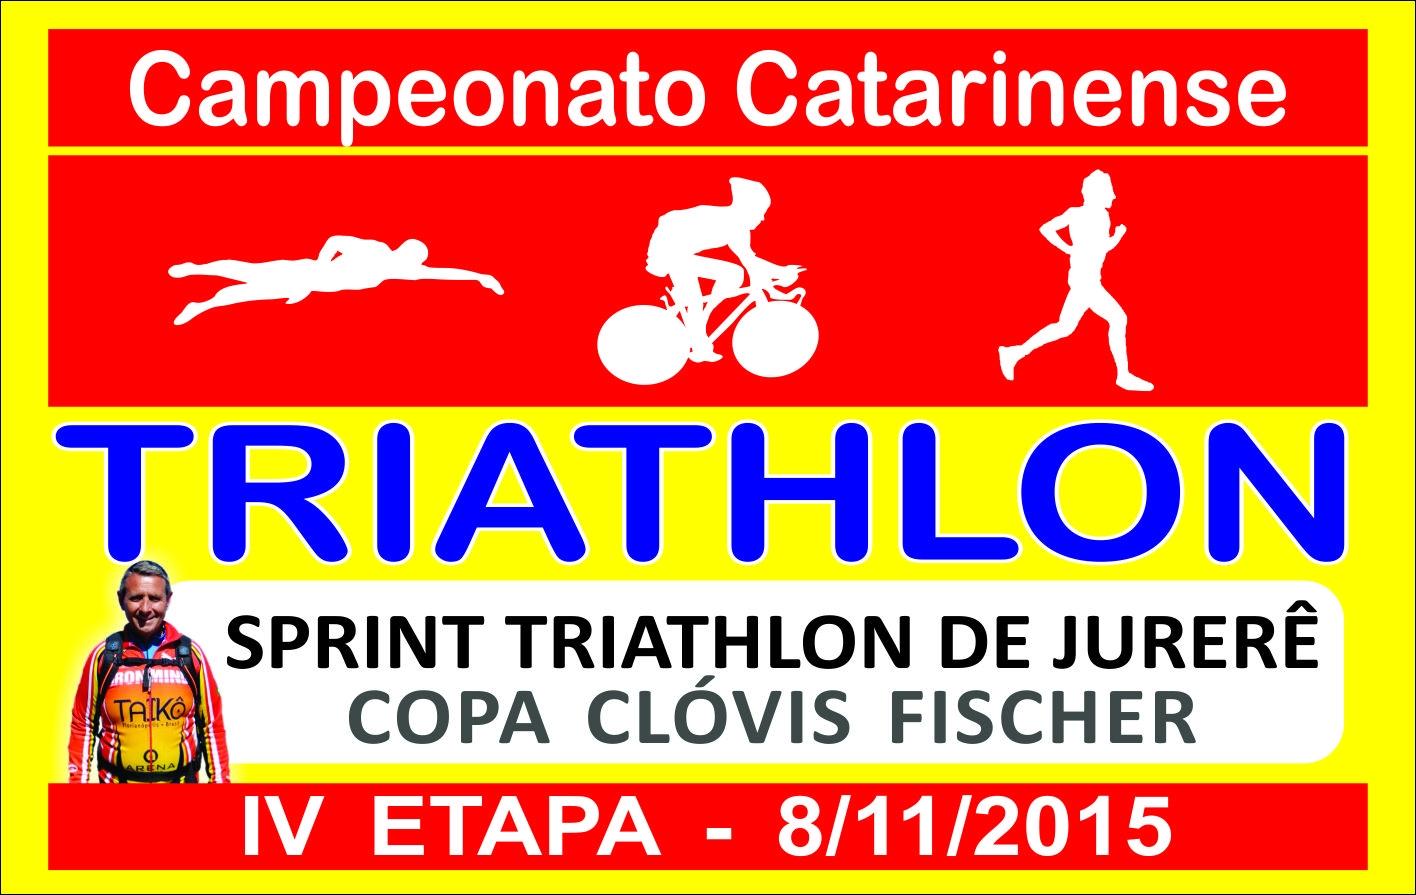 Sprint Triathlon de Jurerê - Copa Clóvis Fischer